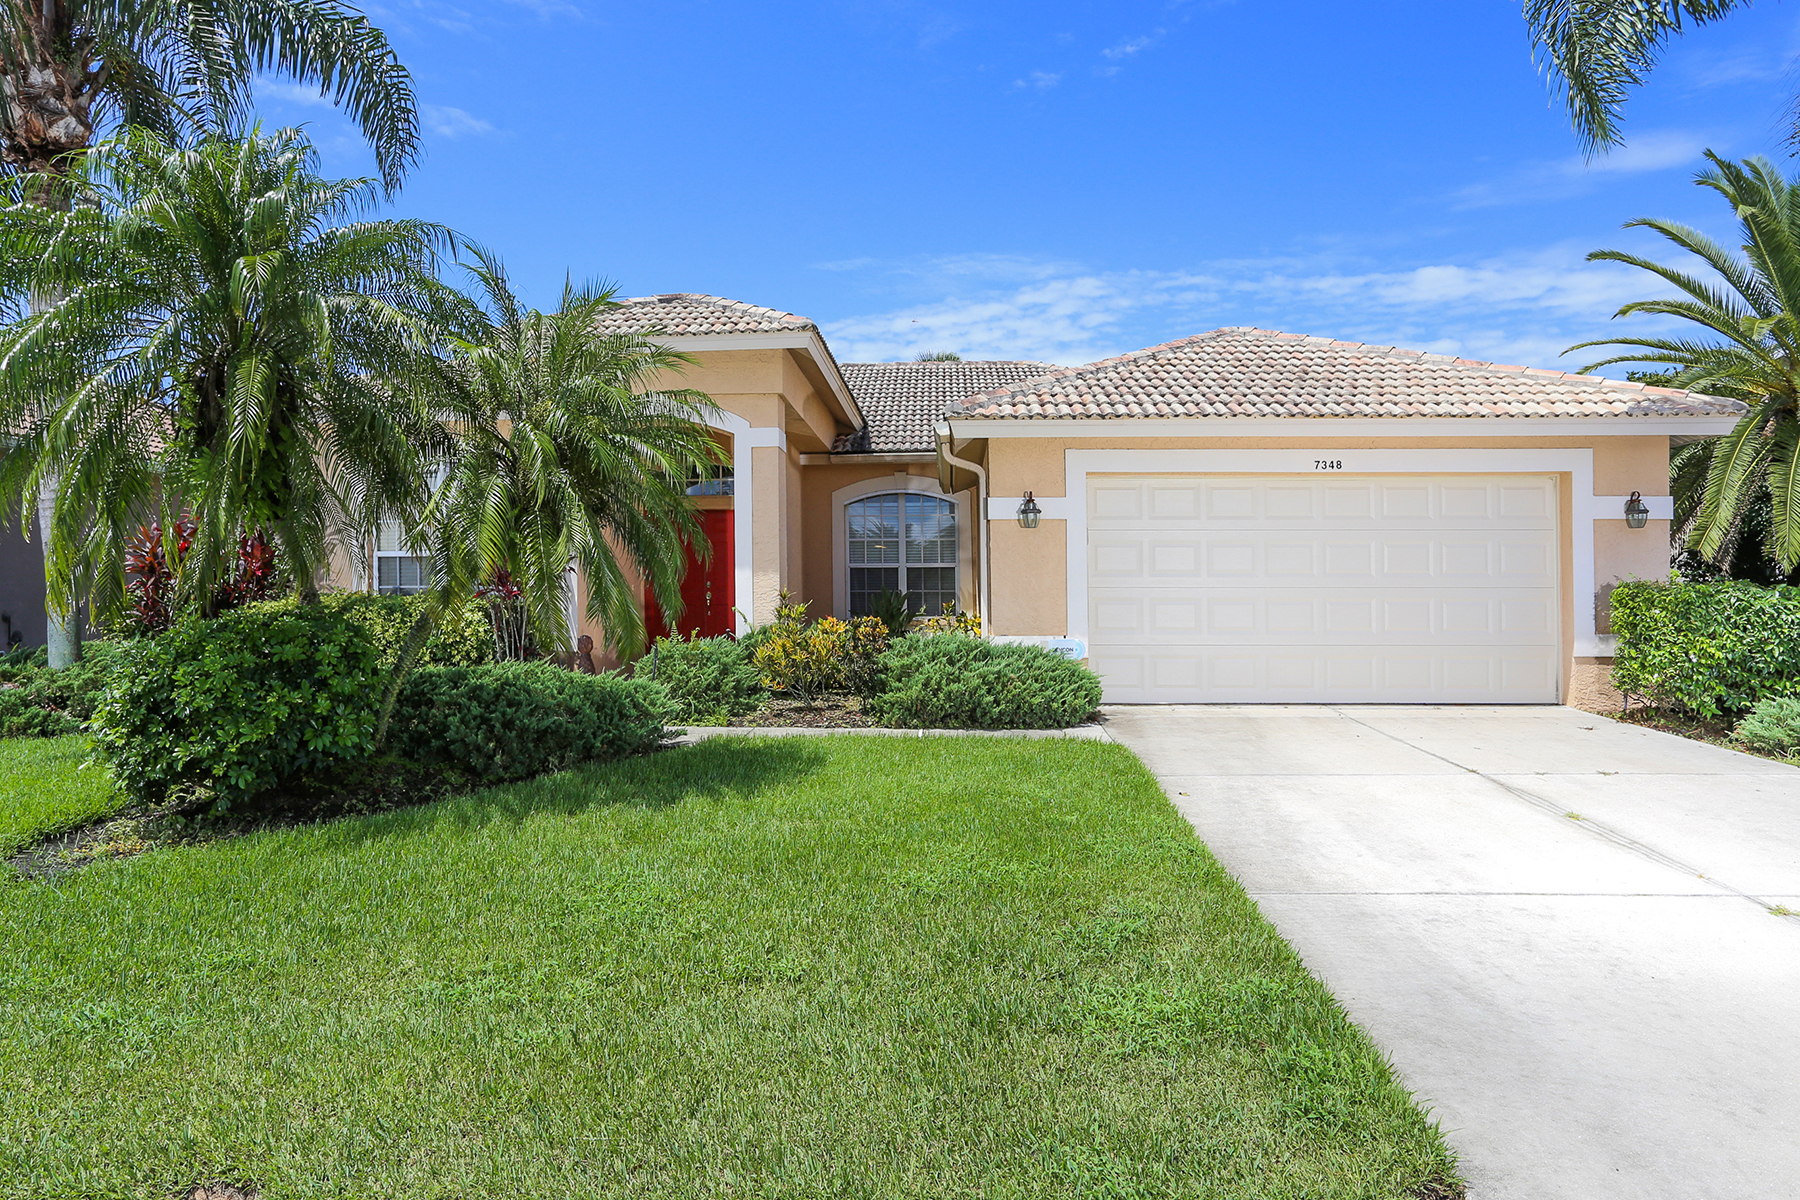 Casa Unifamiliar por un Alquiler en PALMER RANCH-STONEBRIDGE 7348 Featherstone Blvd Sarasota, Florida 34238 Estados Unidos